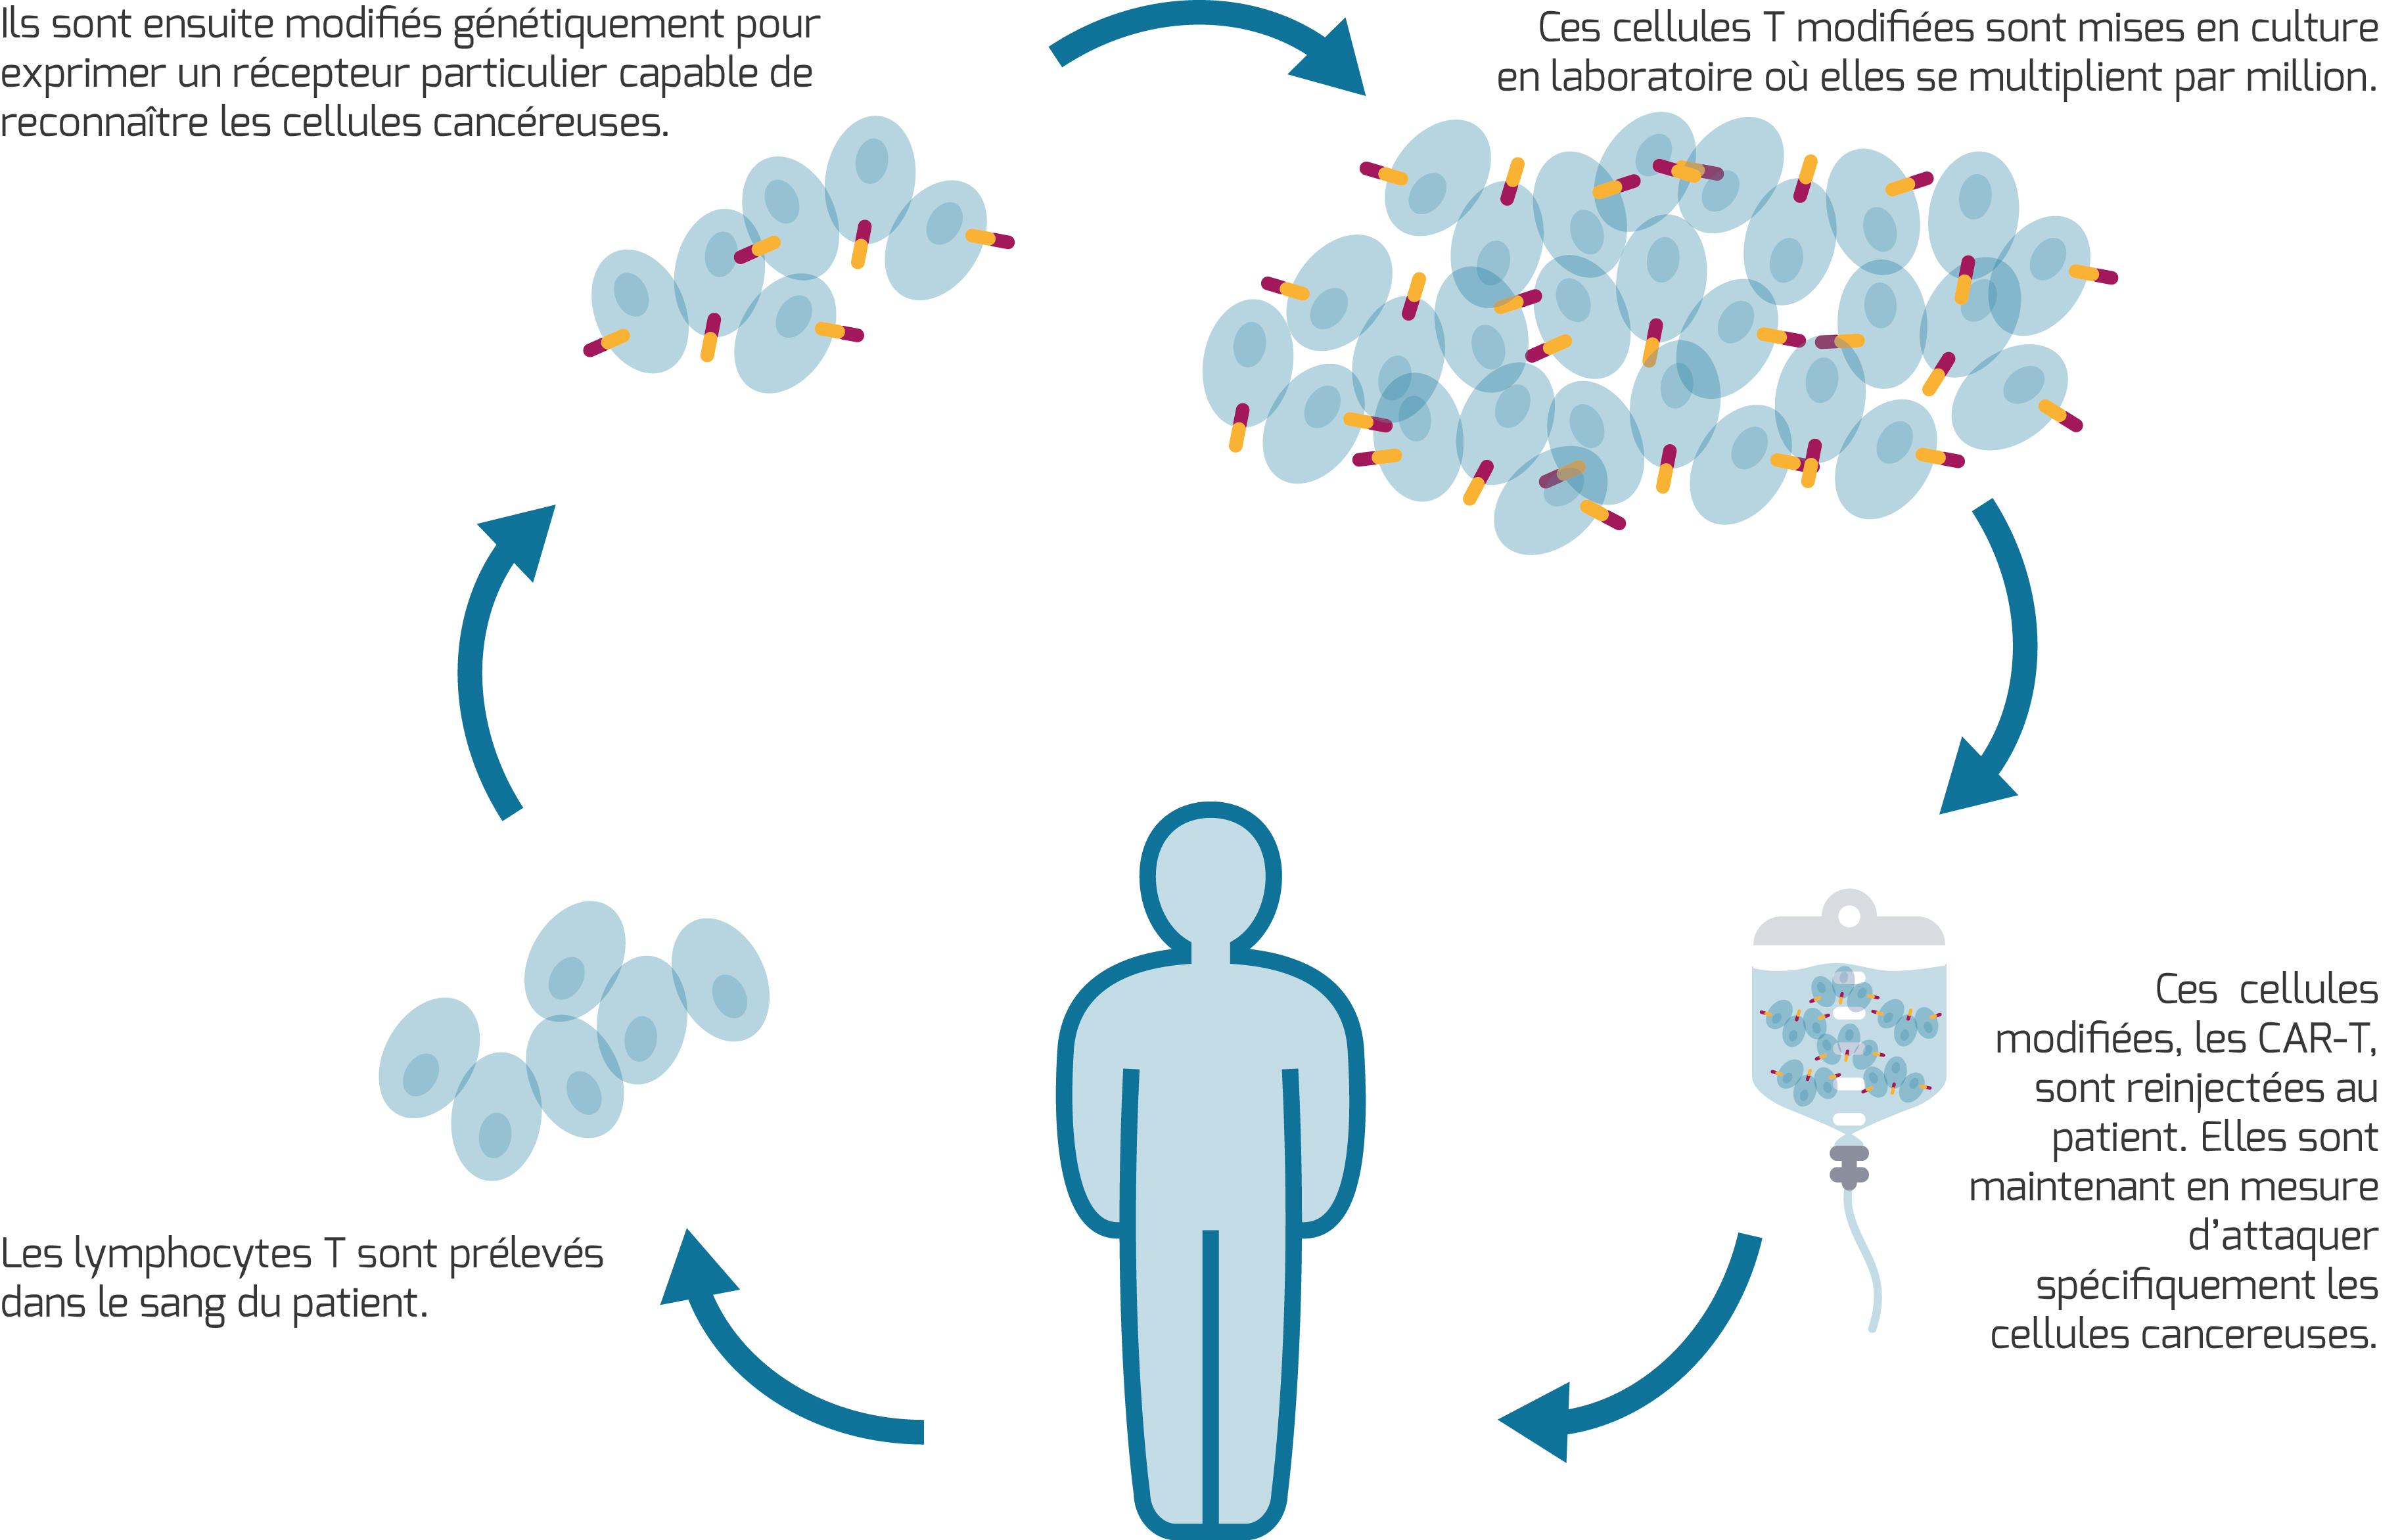 Le transfert adoptif de cellules